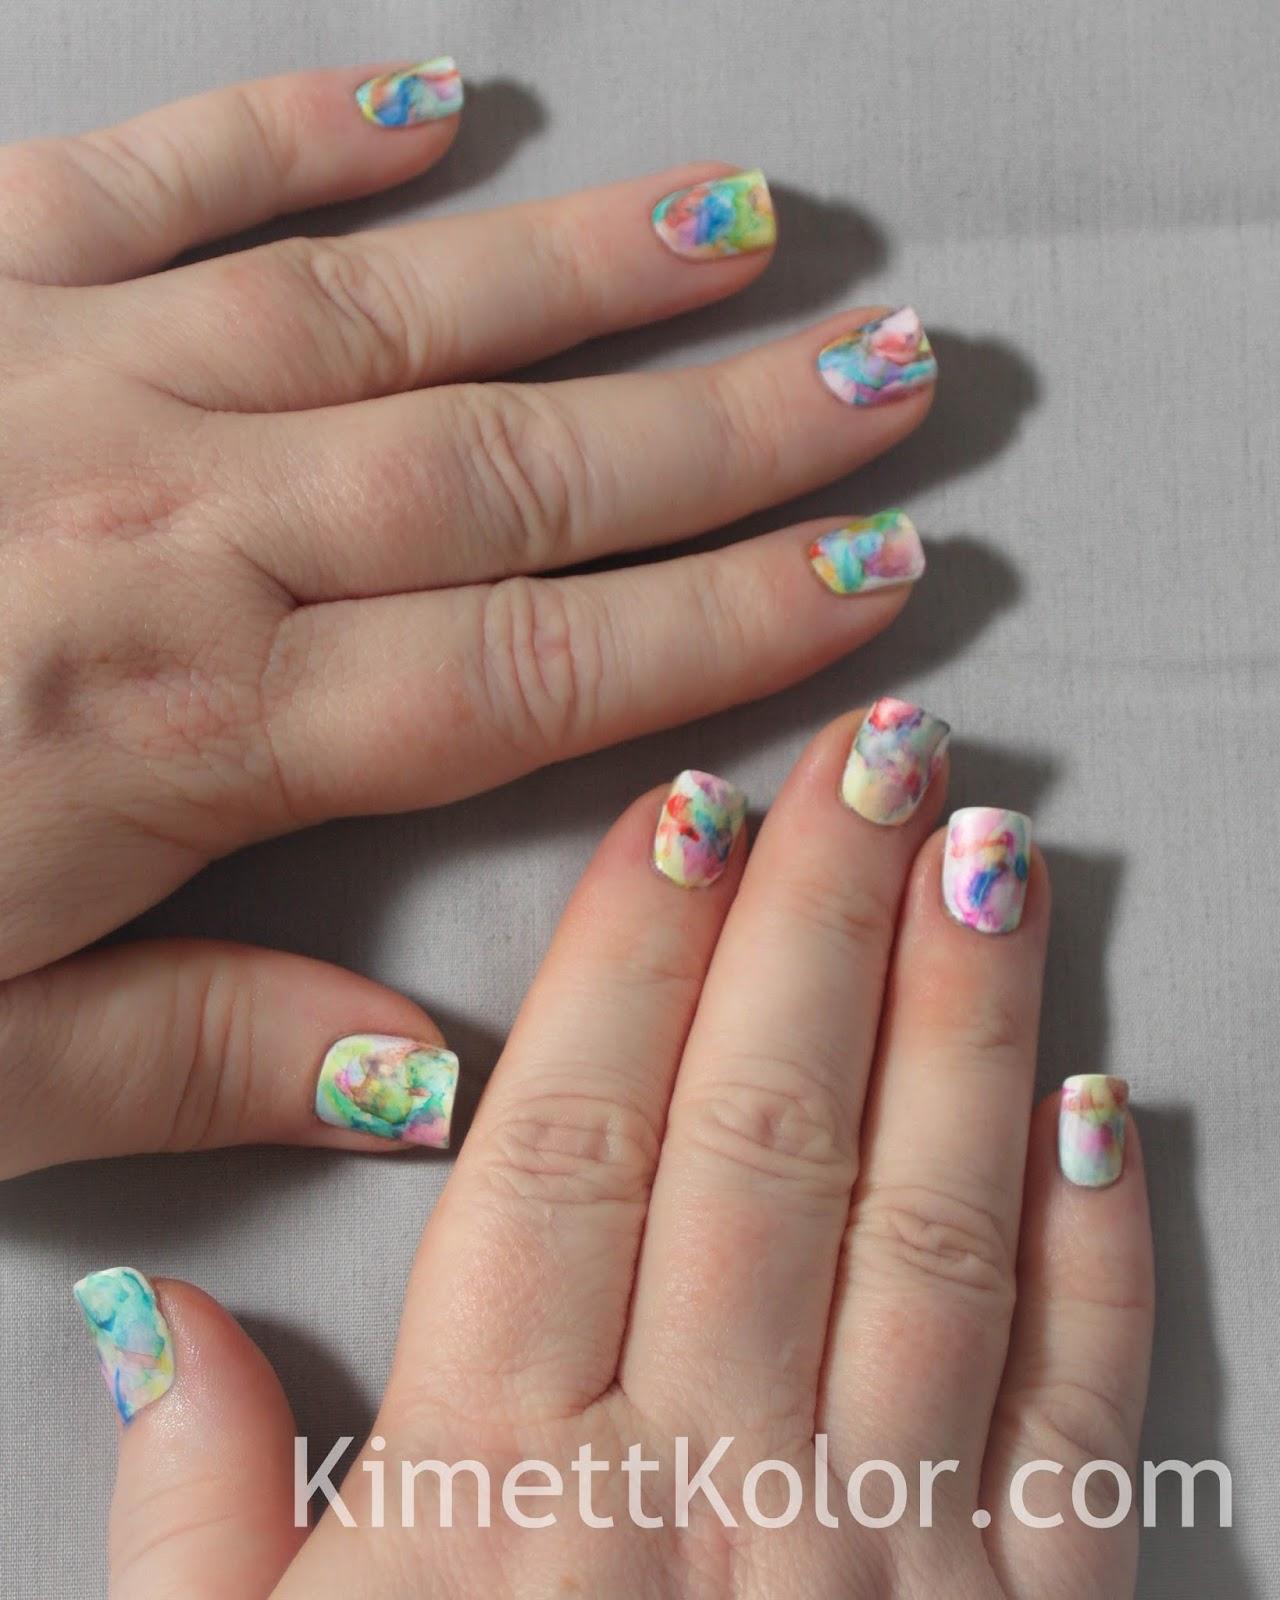 Abstract Watercolor Painting - On My Nails! | Kimett Kolor